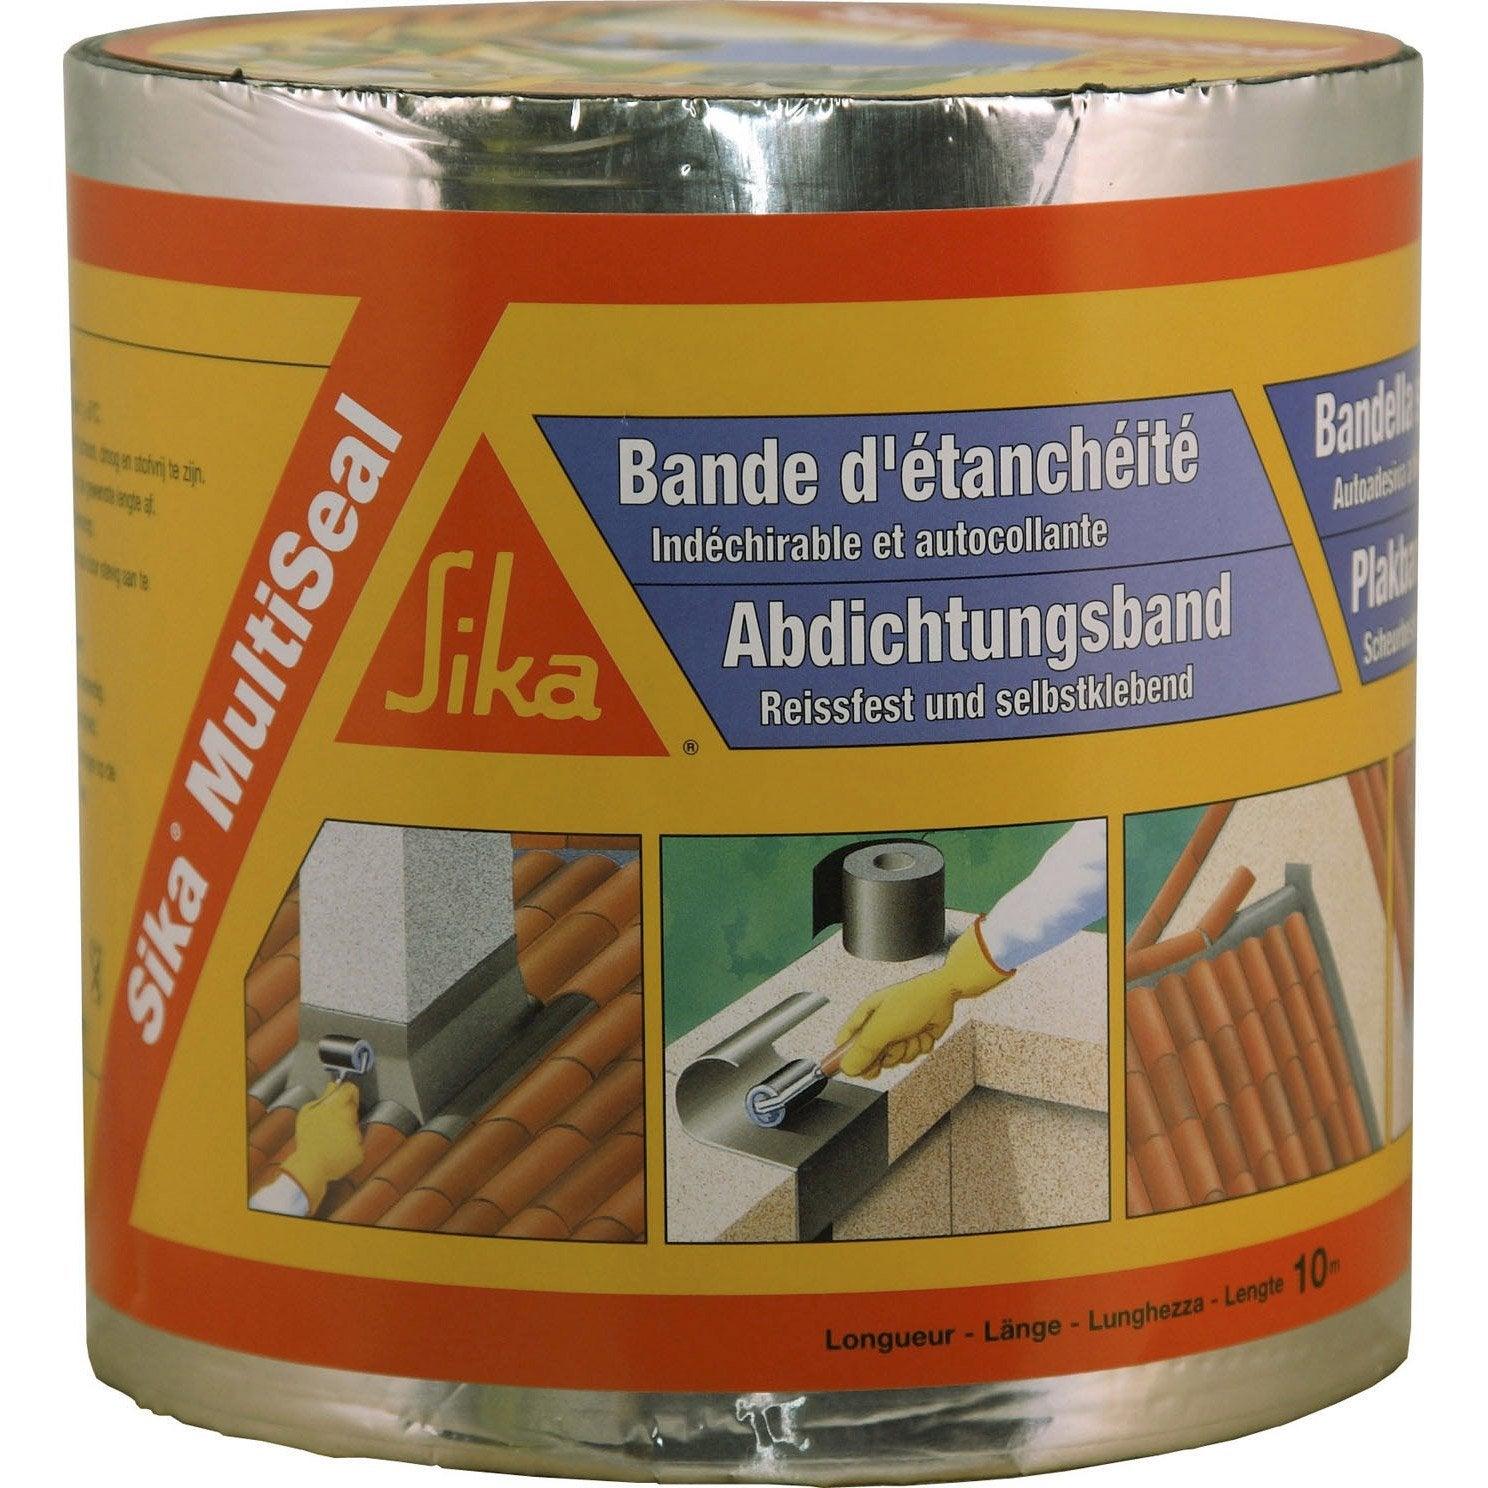 Bande Adhesive D Etancheite Sika Multiseal L 10 X L 0 15 M 1151 G M Etancheite Terrasse Etancheite Et Revetement Terrasse